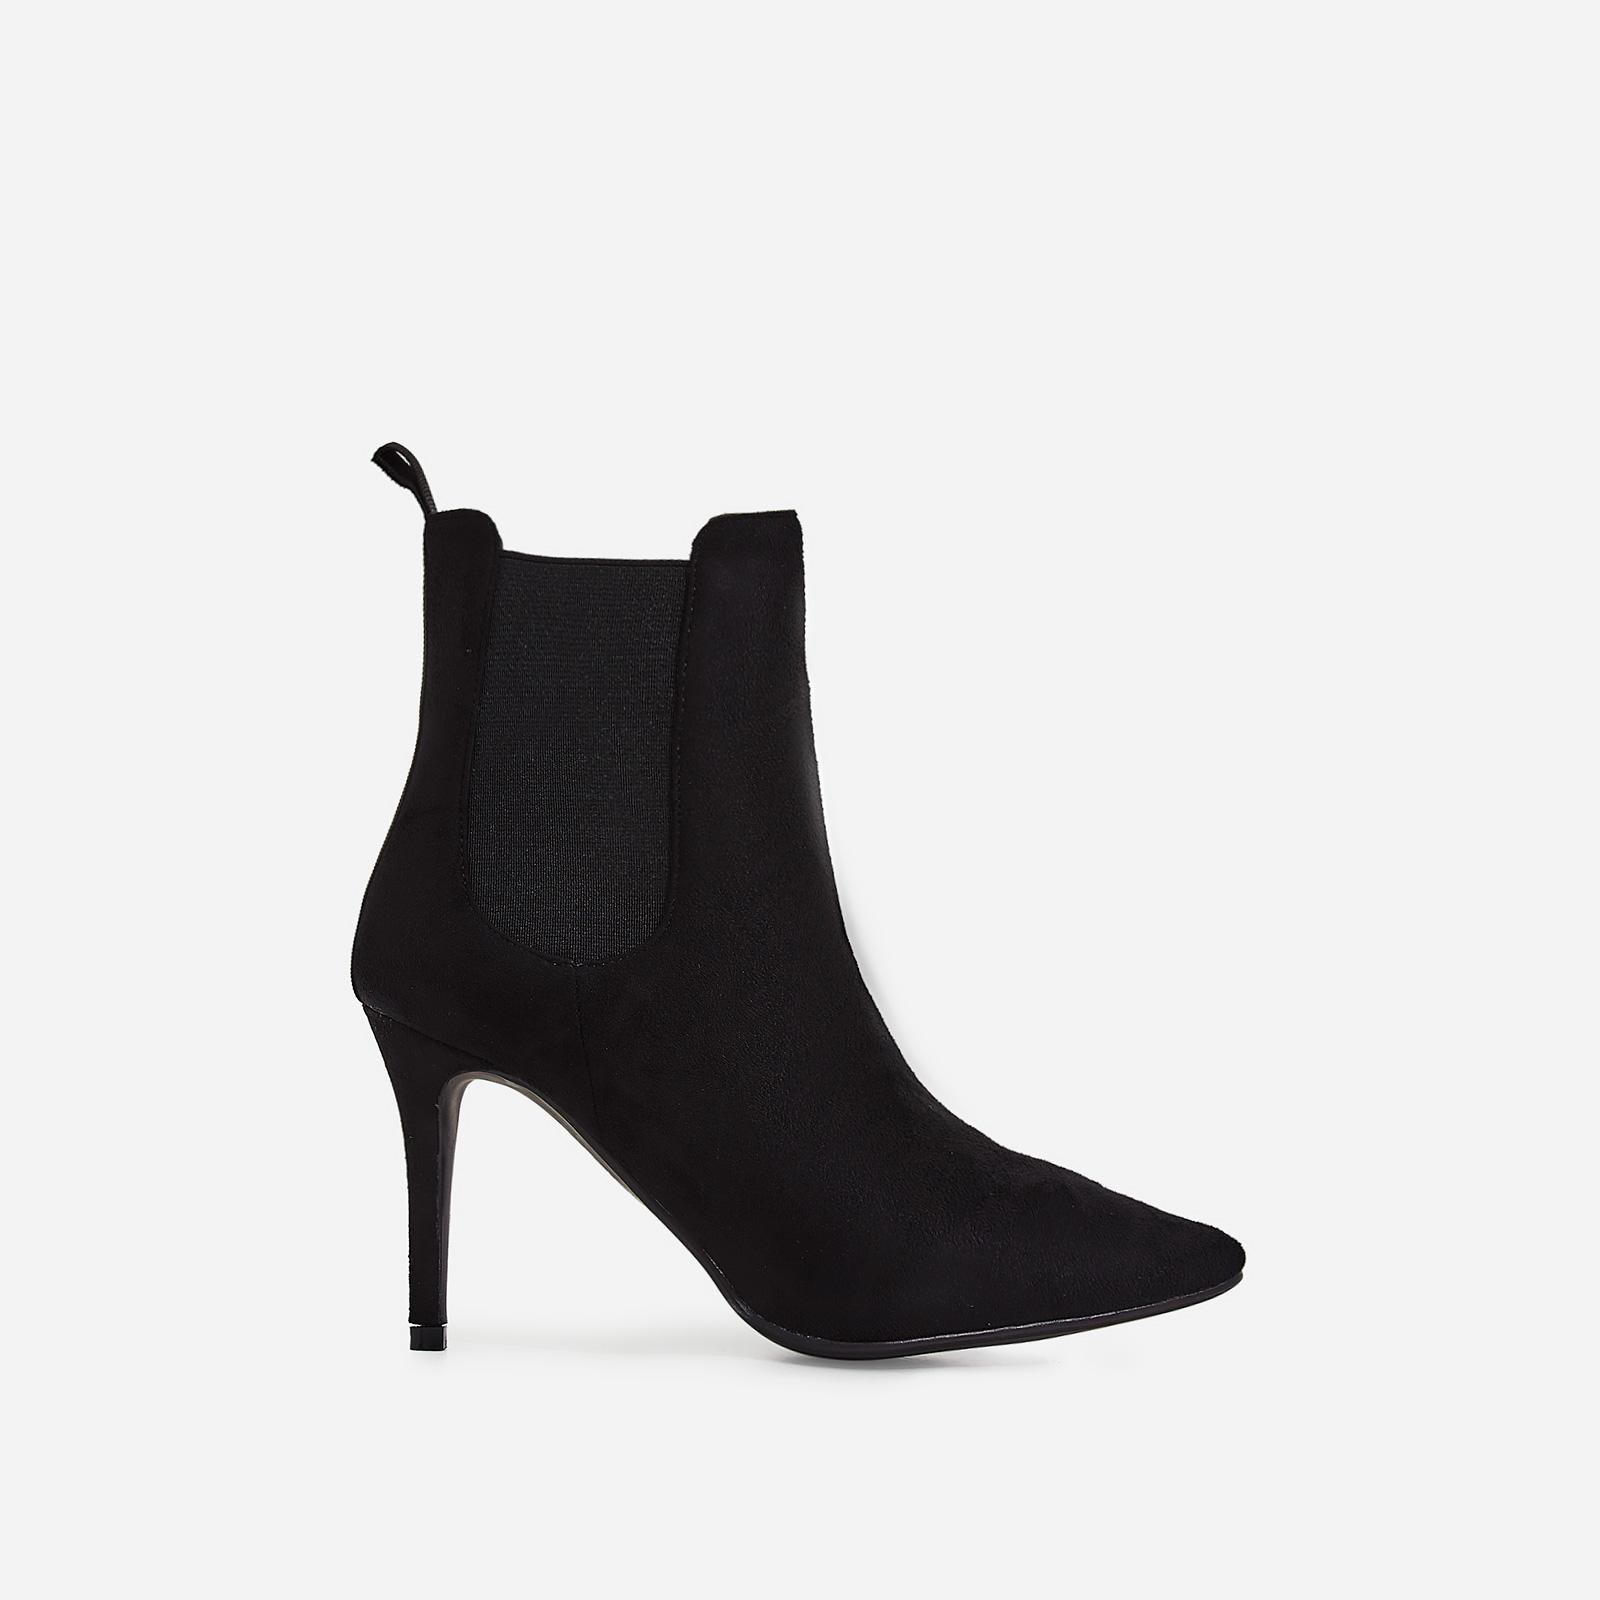 Hettie Elasticated Ankle Boot In Black Faux Suede